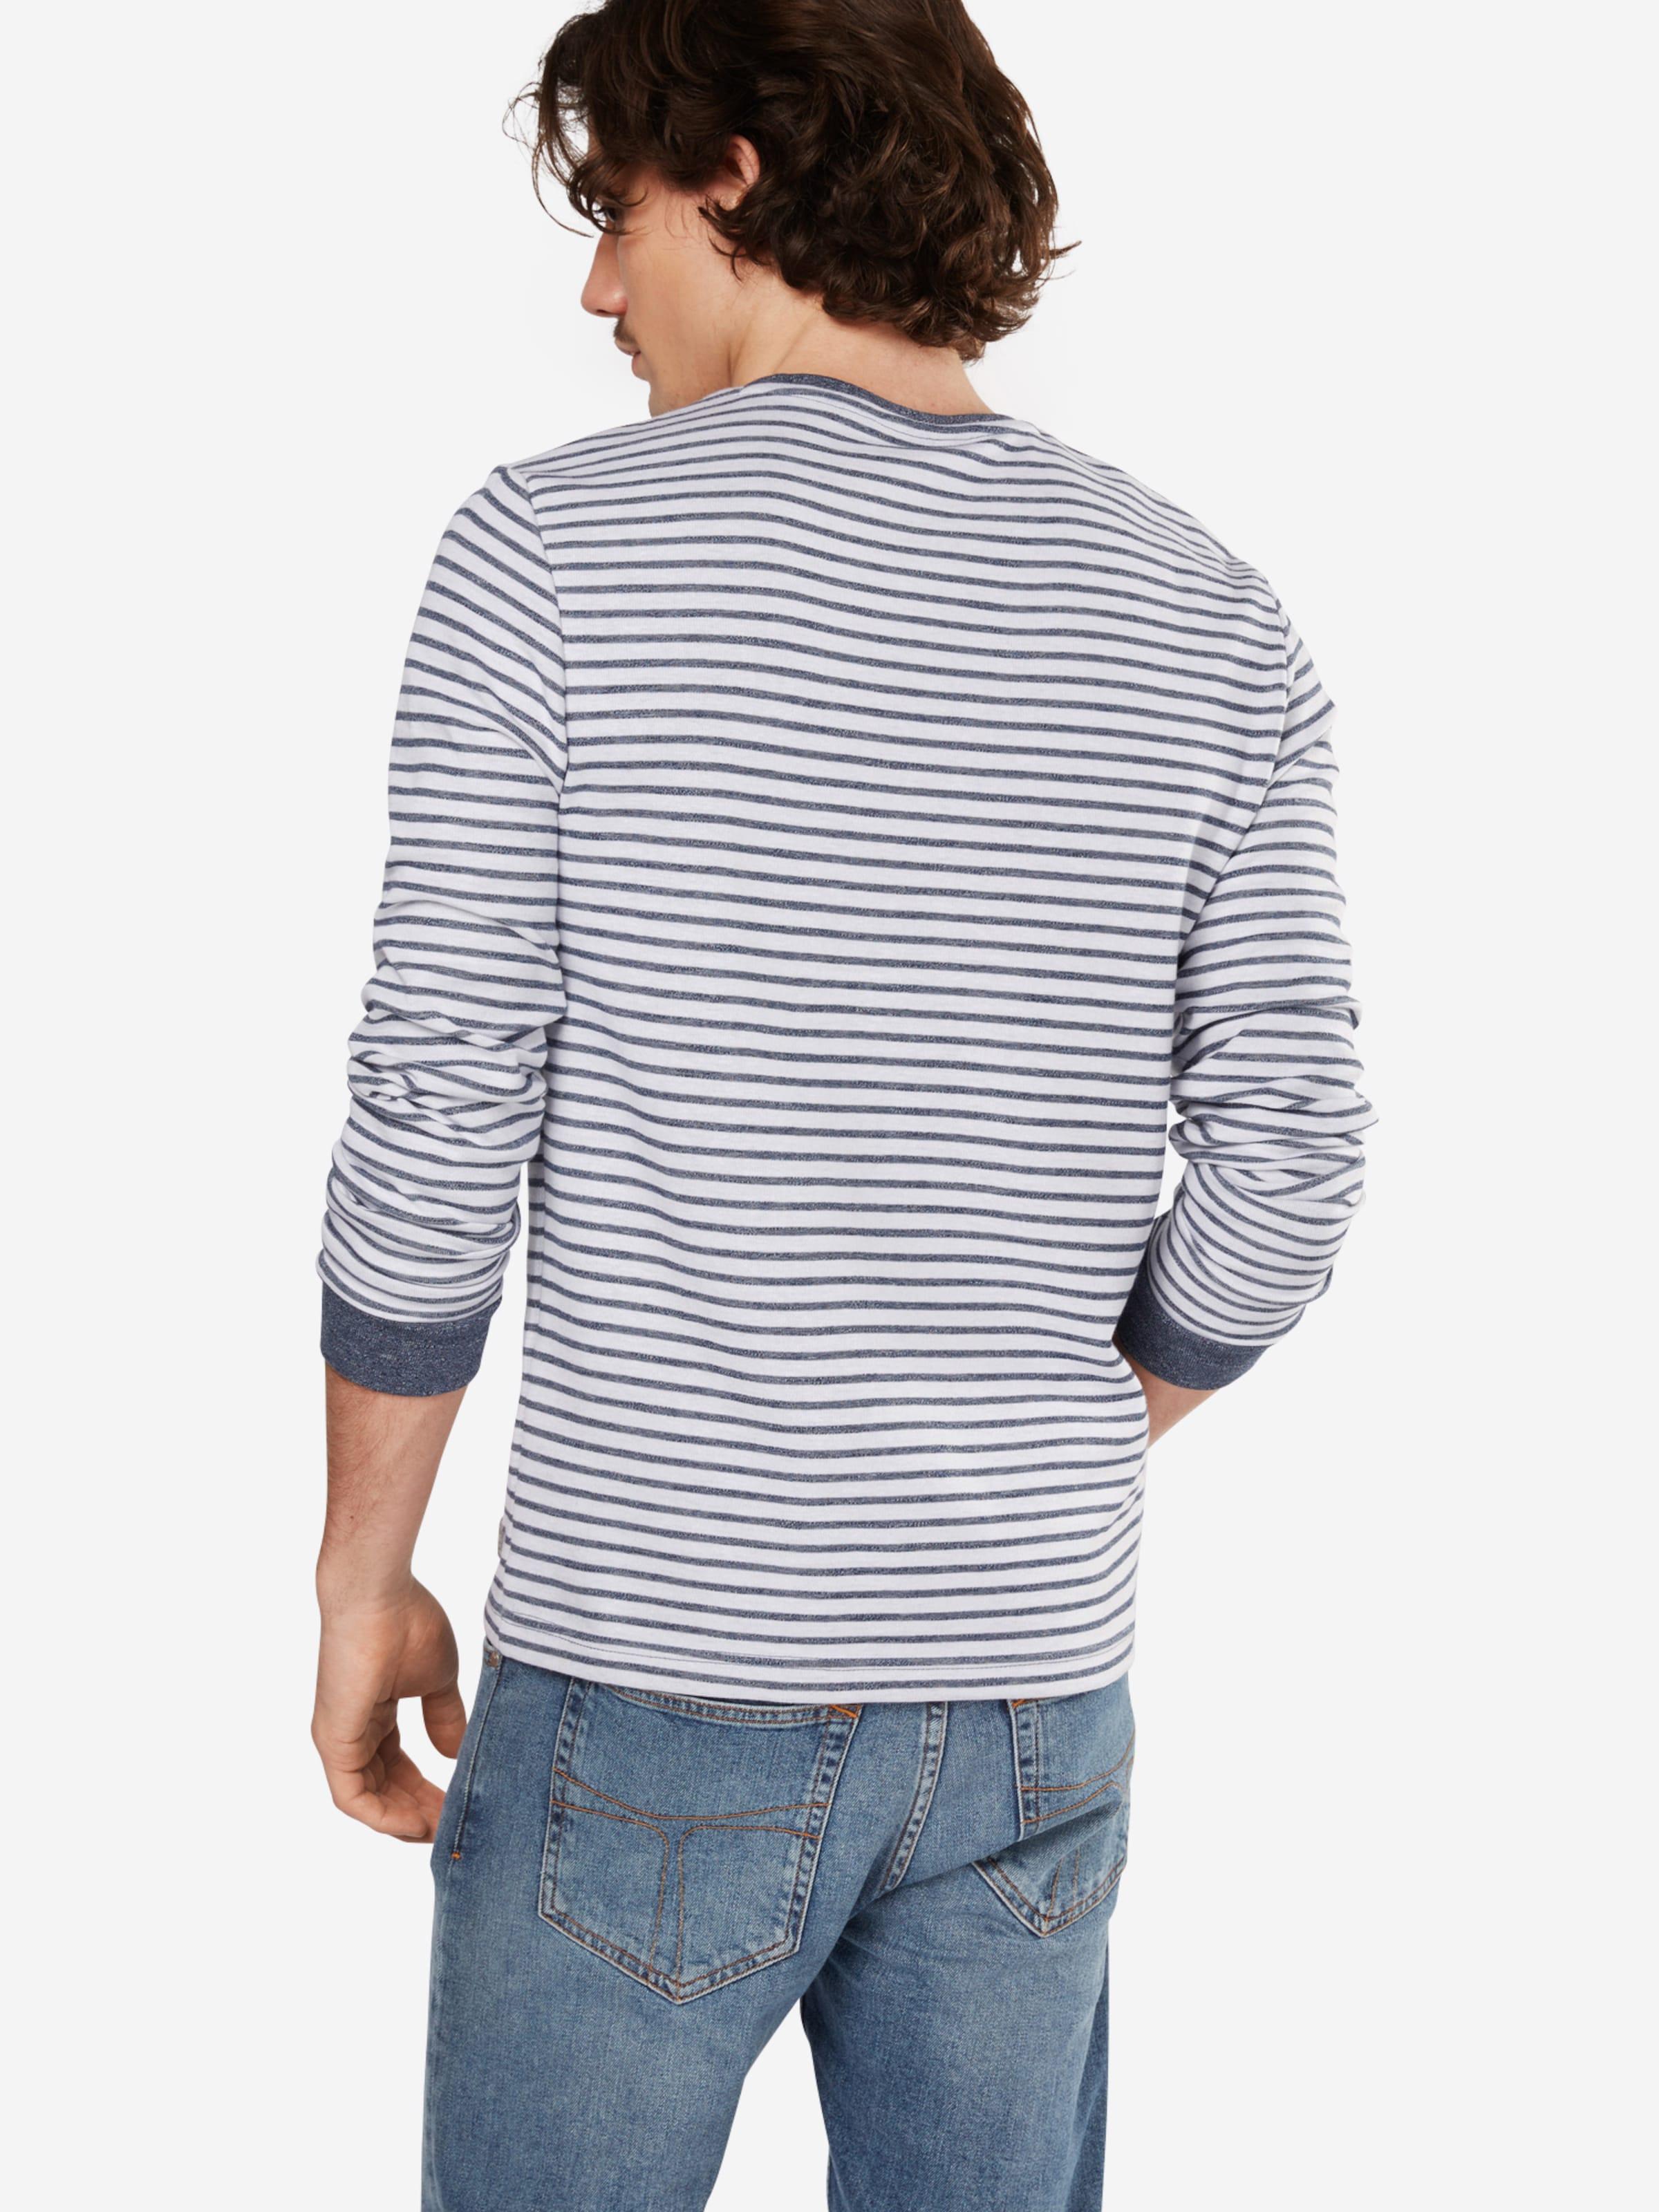 Billig 100% Authentisch 100% Original Günstig Online TOM TAILOR Langarmshirt 'with stripes' gpHwc5g